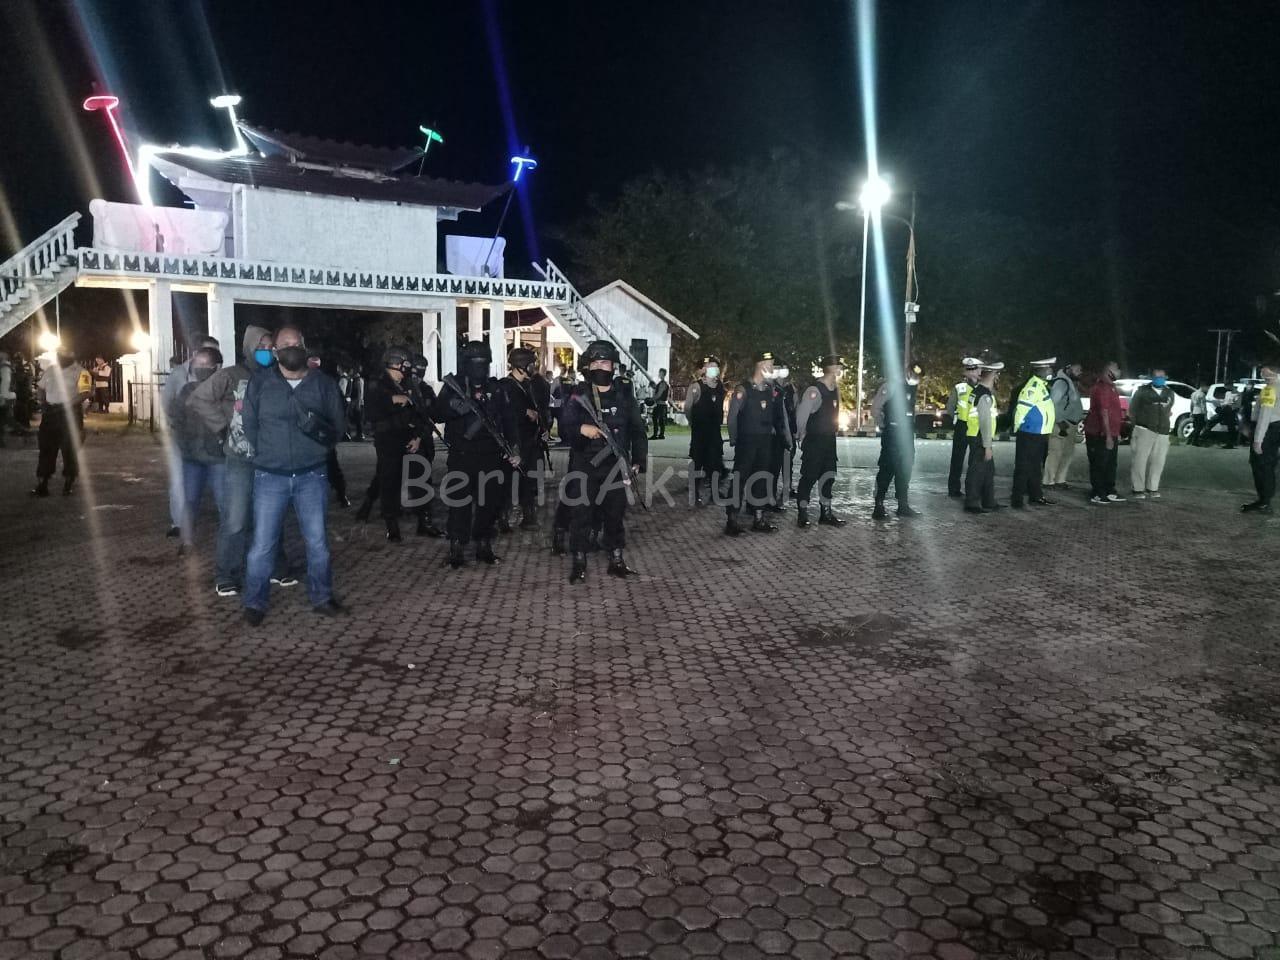 Polda PB Siapkan 317 Personil Buru Pelaku Kejahatan di Manokwari 1 IMG 20200426 WA0060